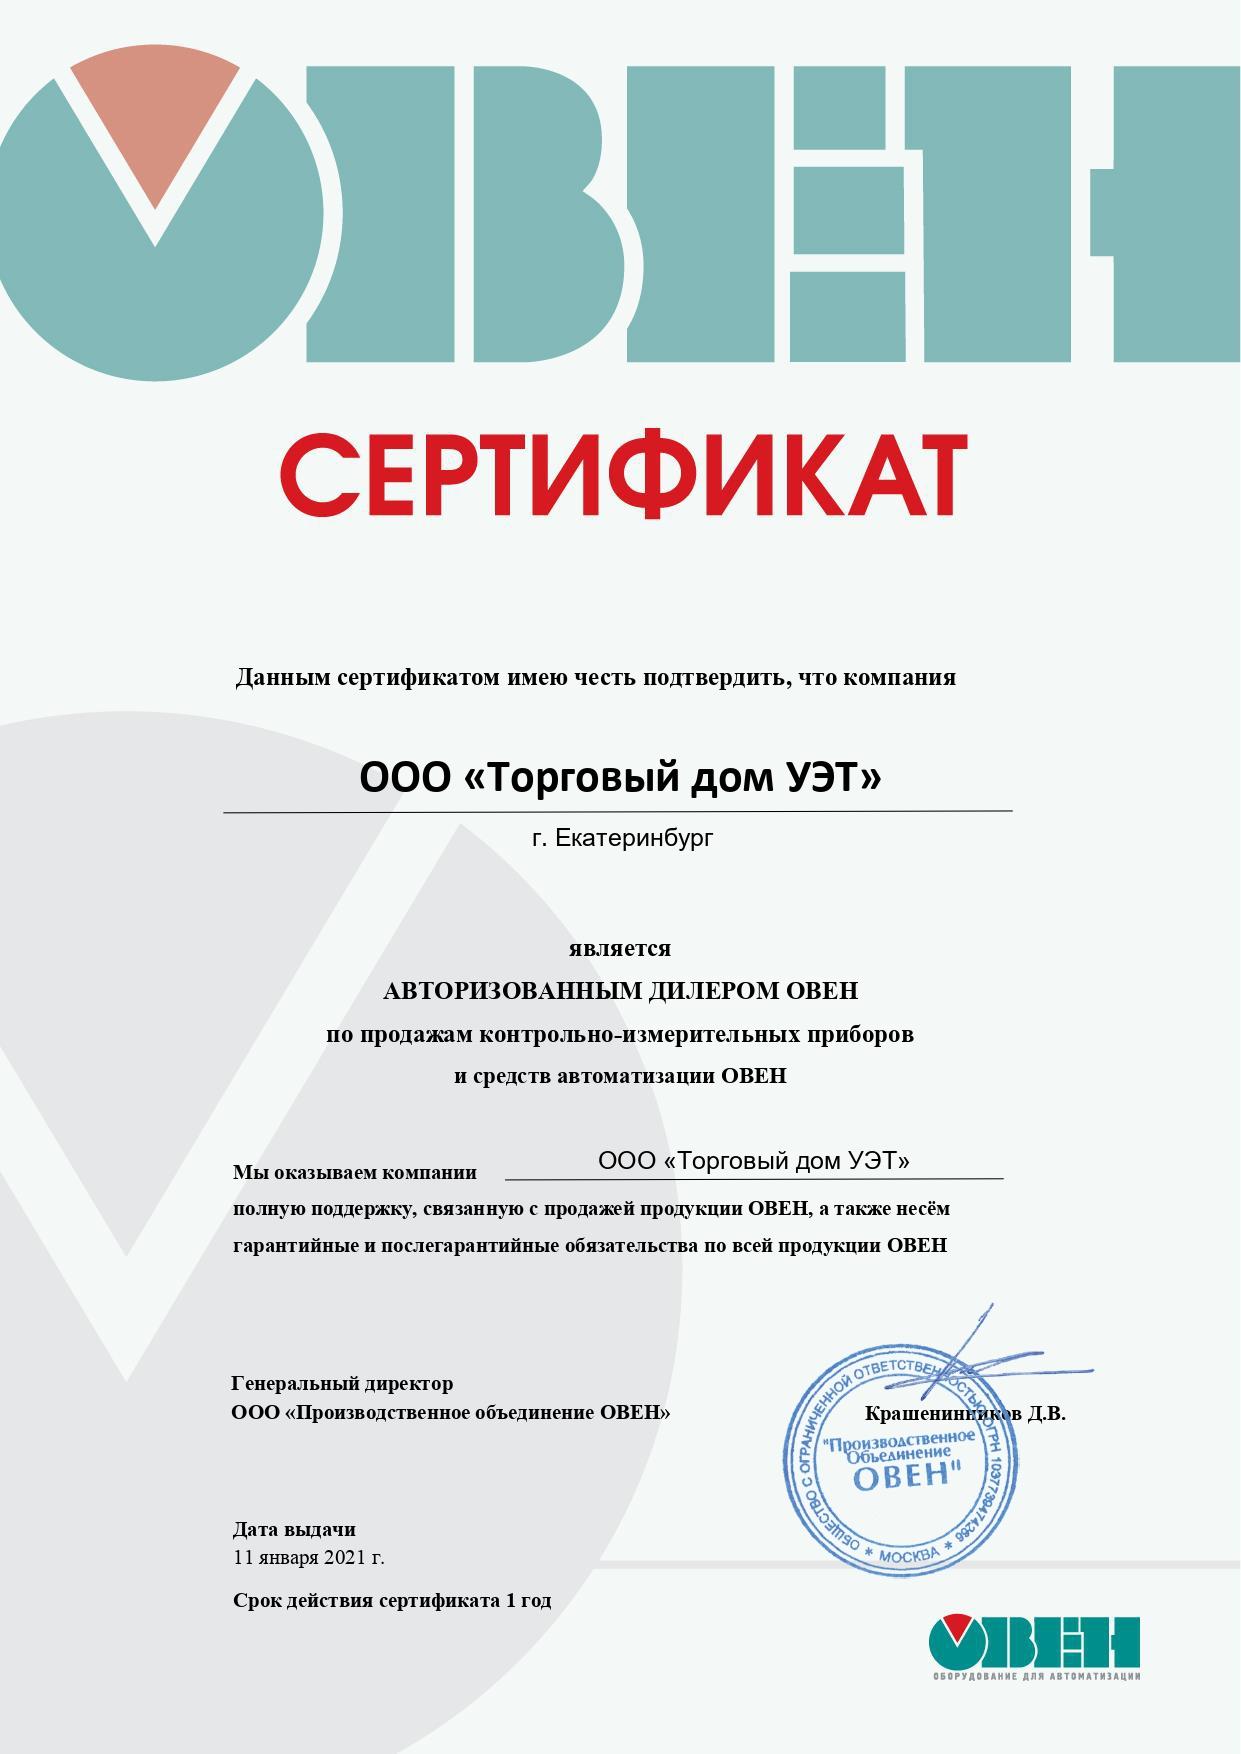 "ООО ""ТД УЭТ"" получил сертификат дилерства компании Овен на 2021г."